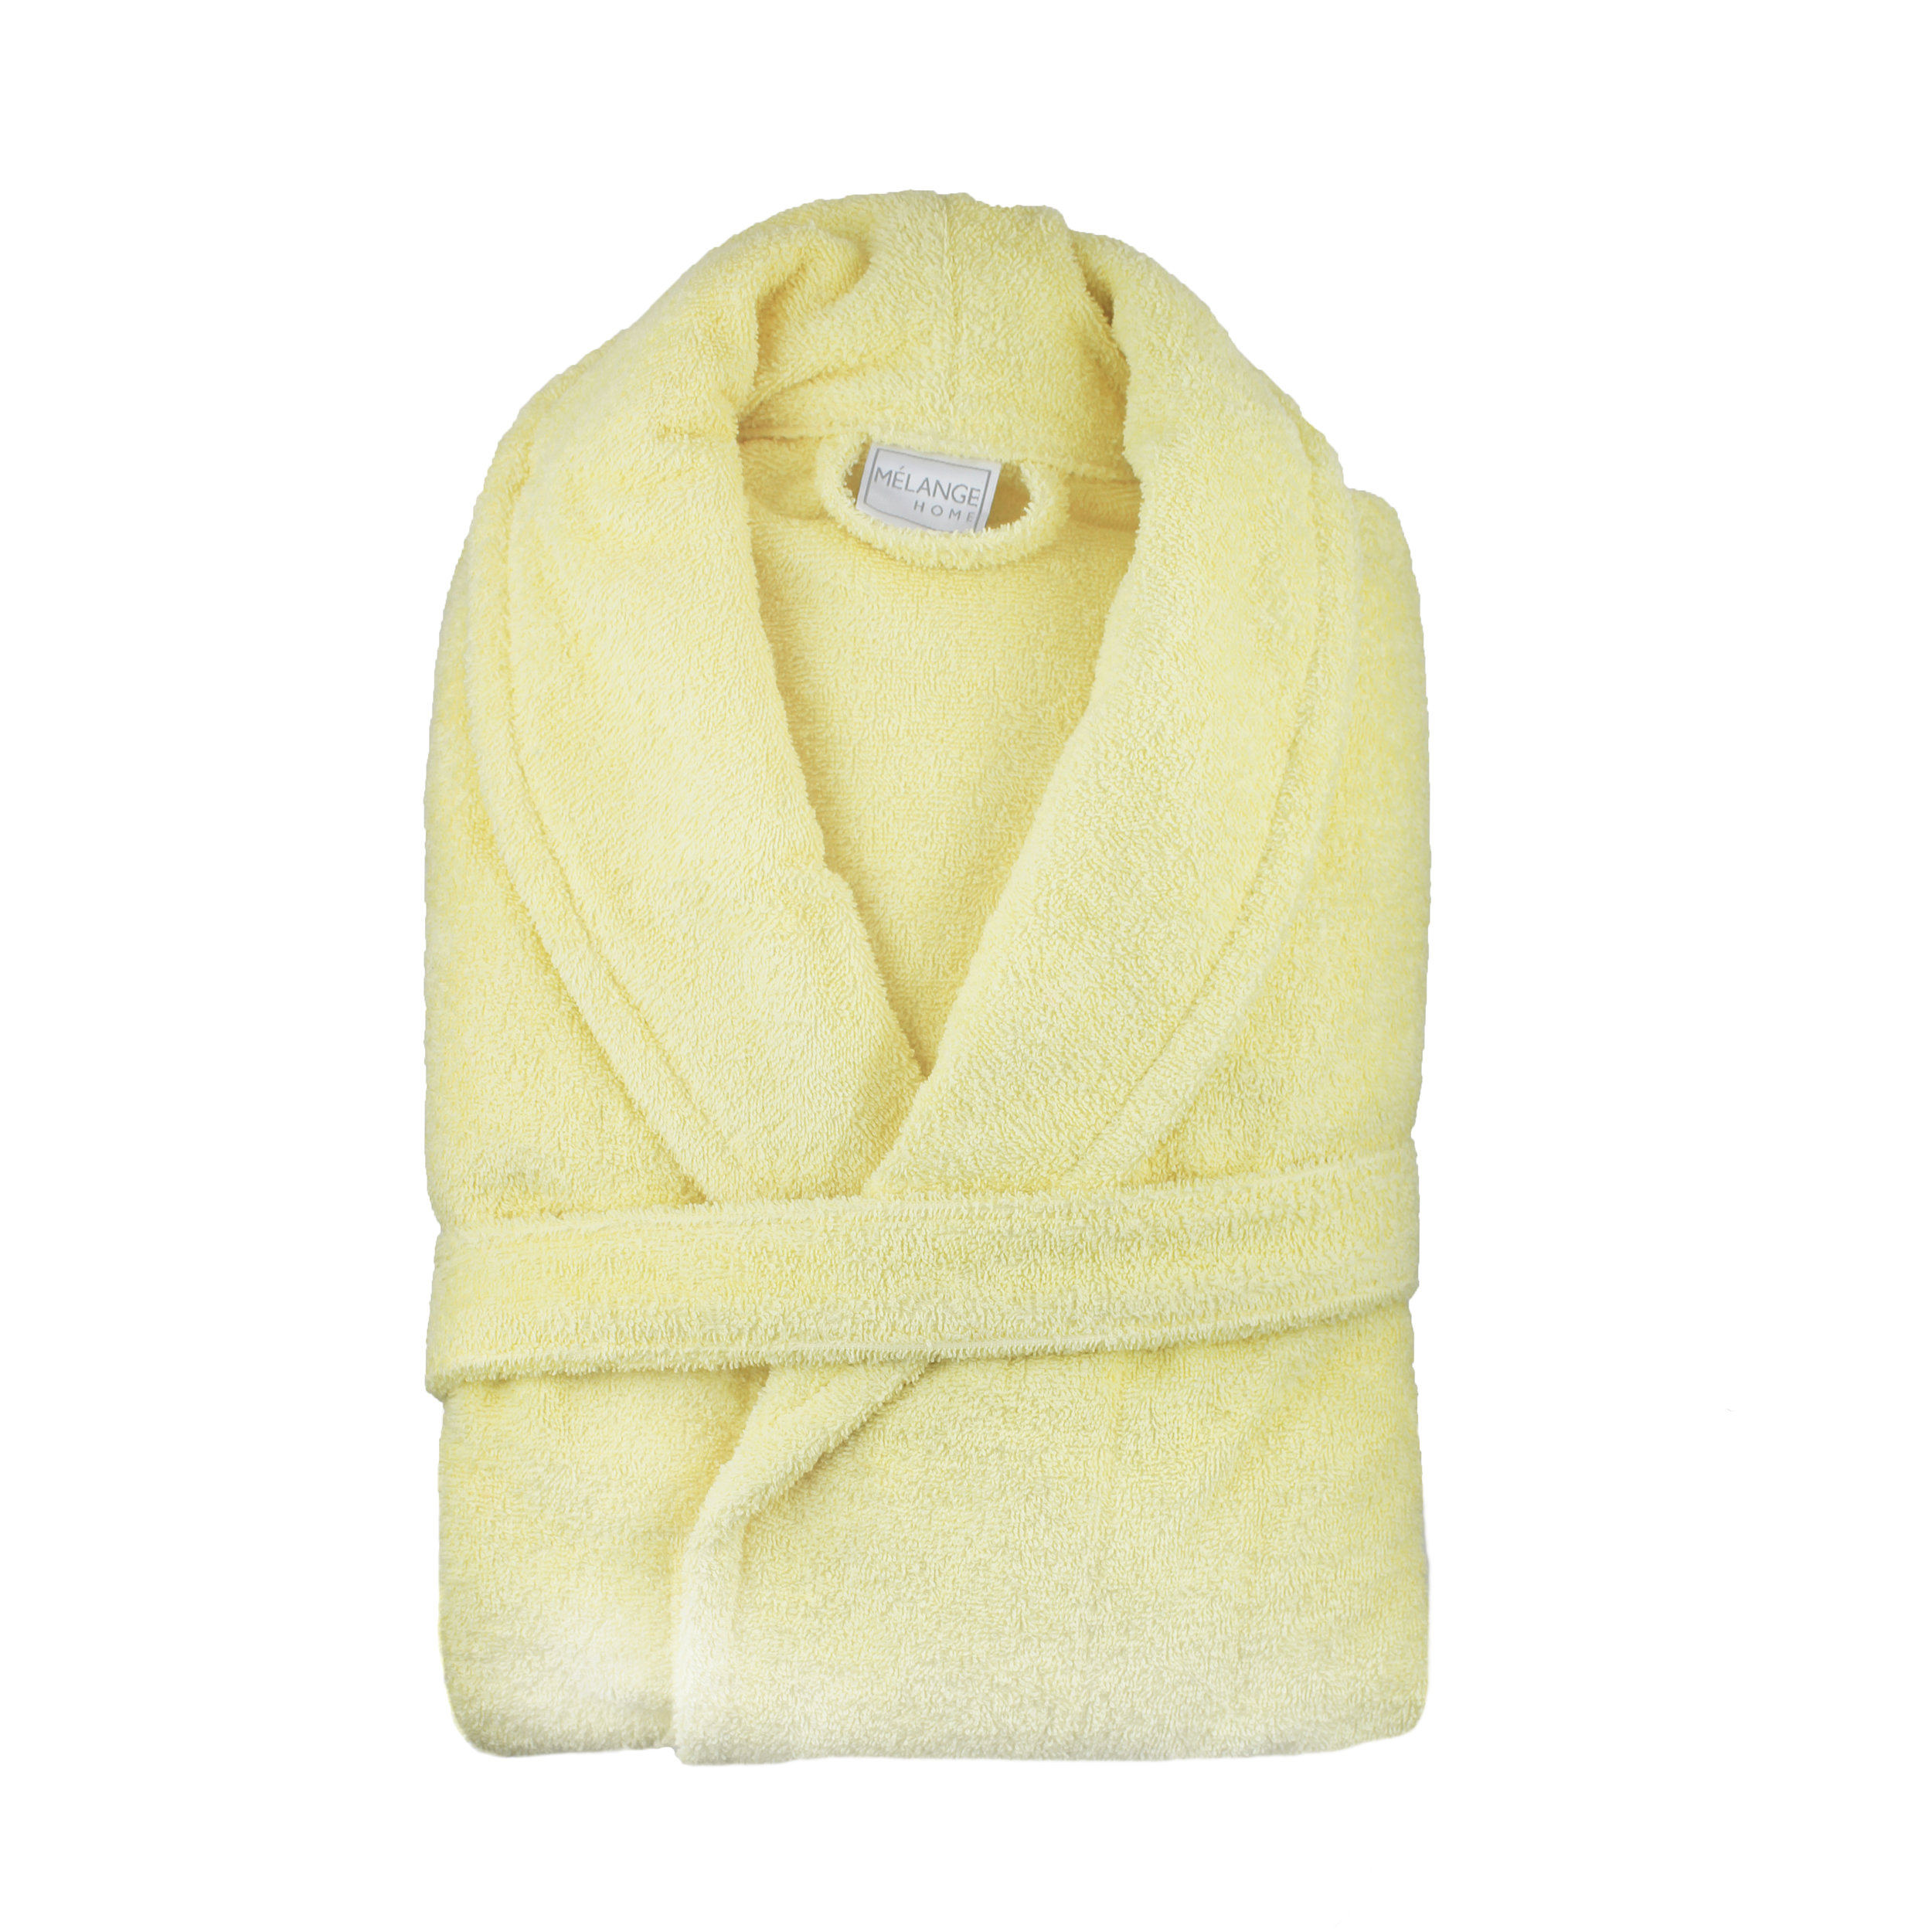 193189 Turkish Bath Robe_Yellow.jpg